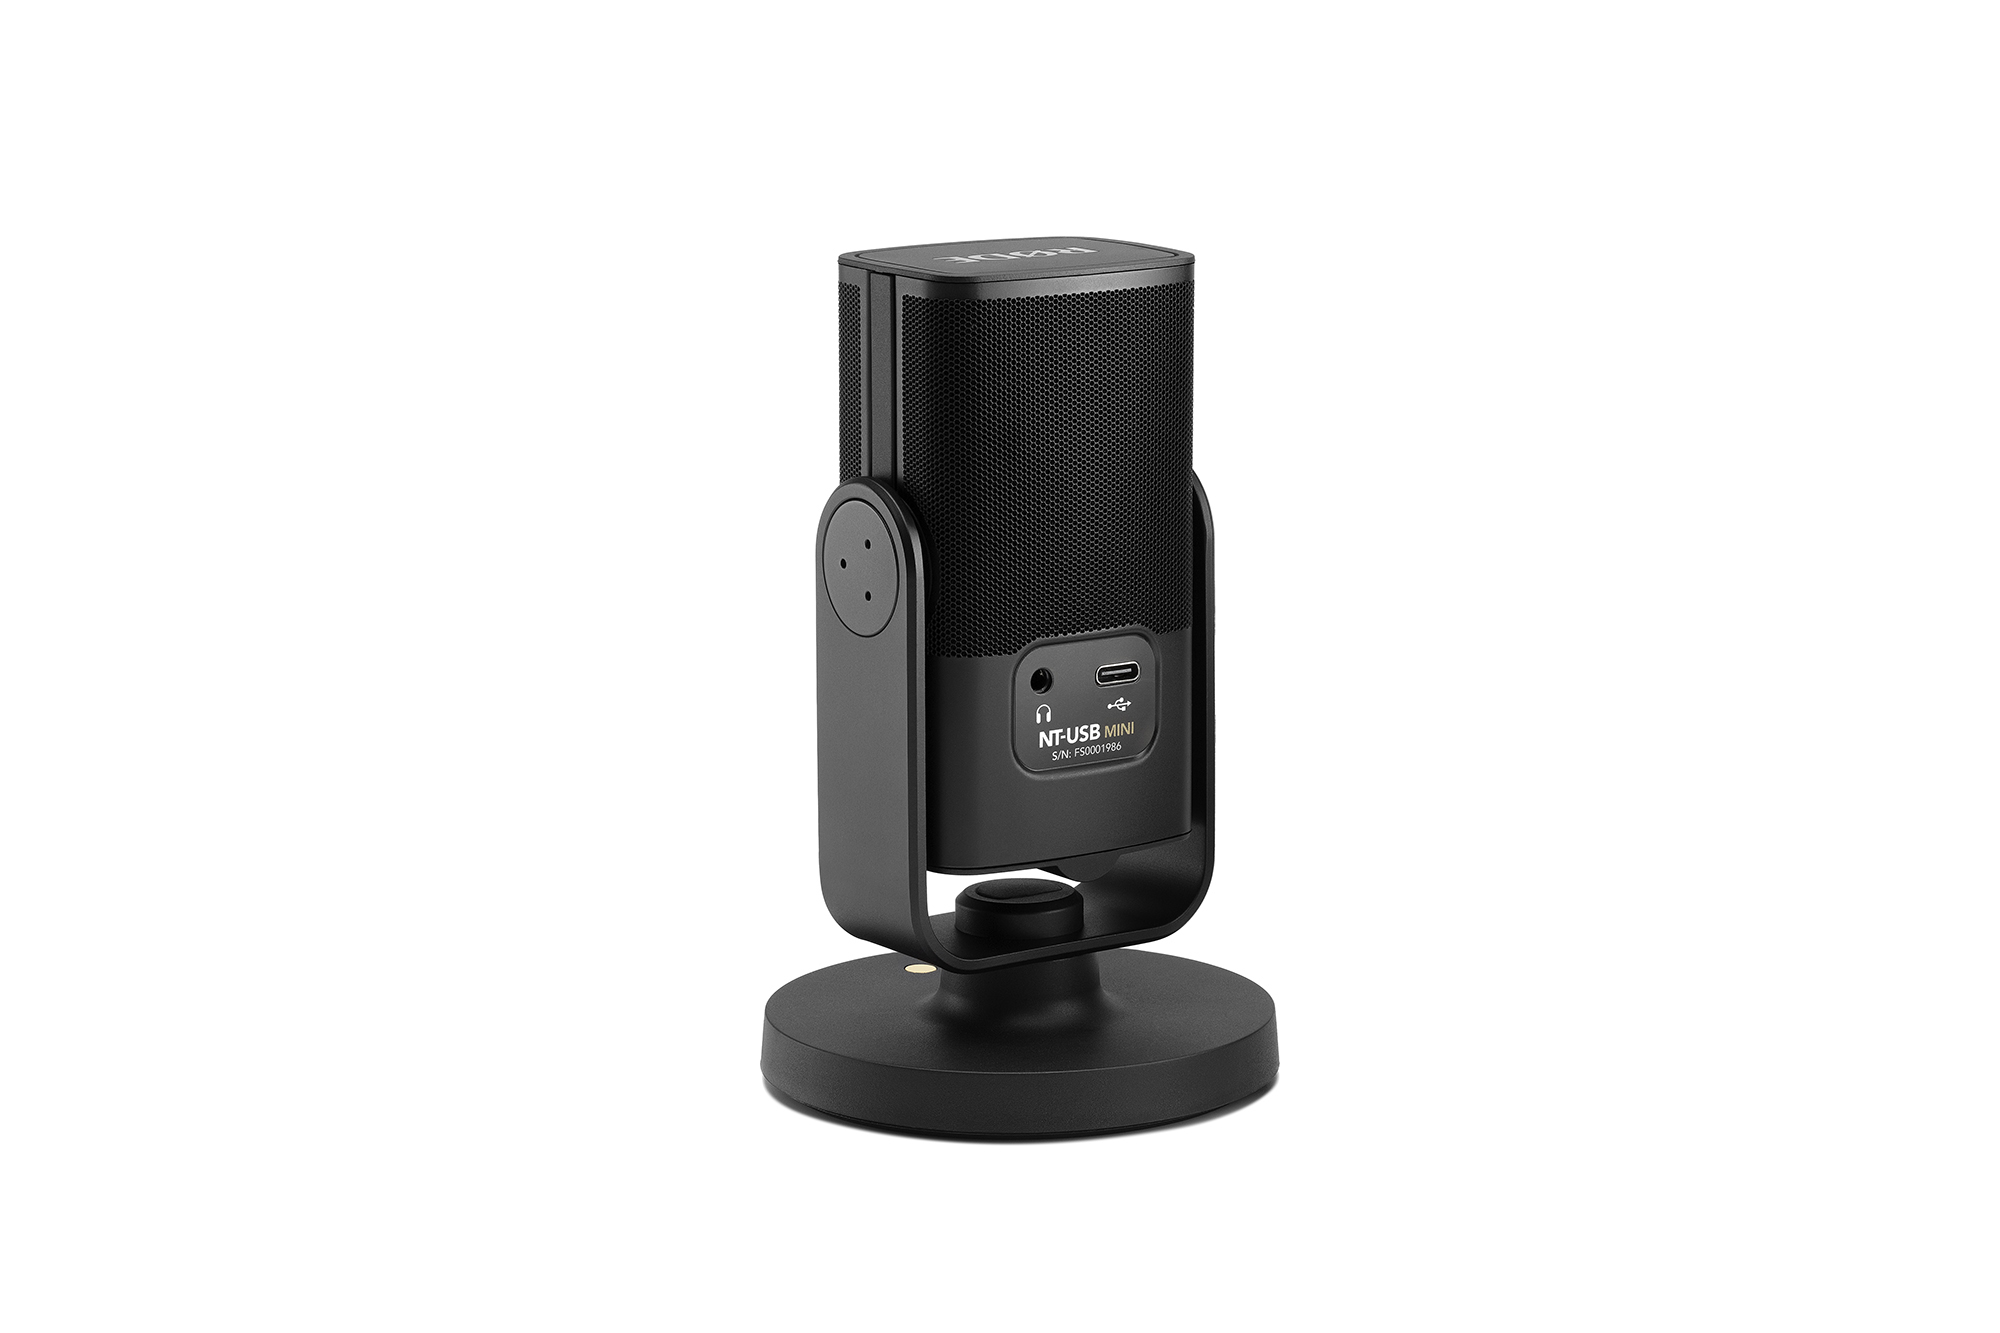 RØDE NT-USB MINI Studio-Quality USB Mic.